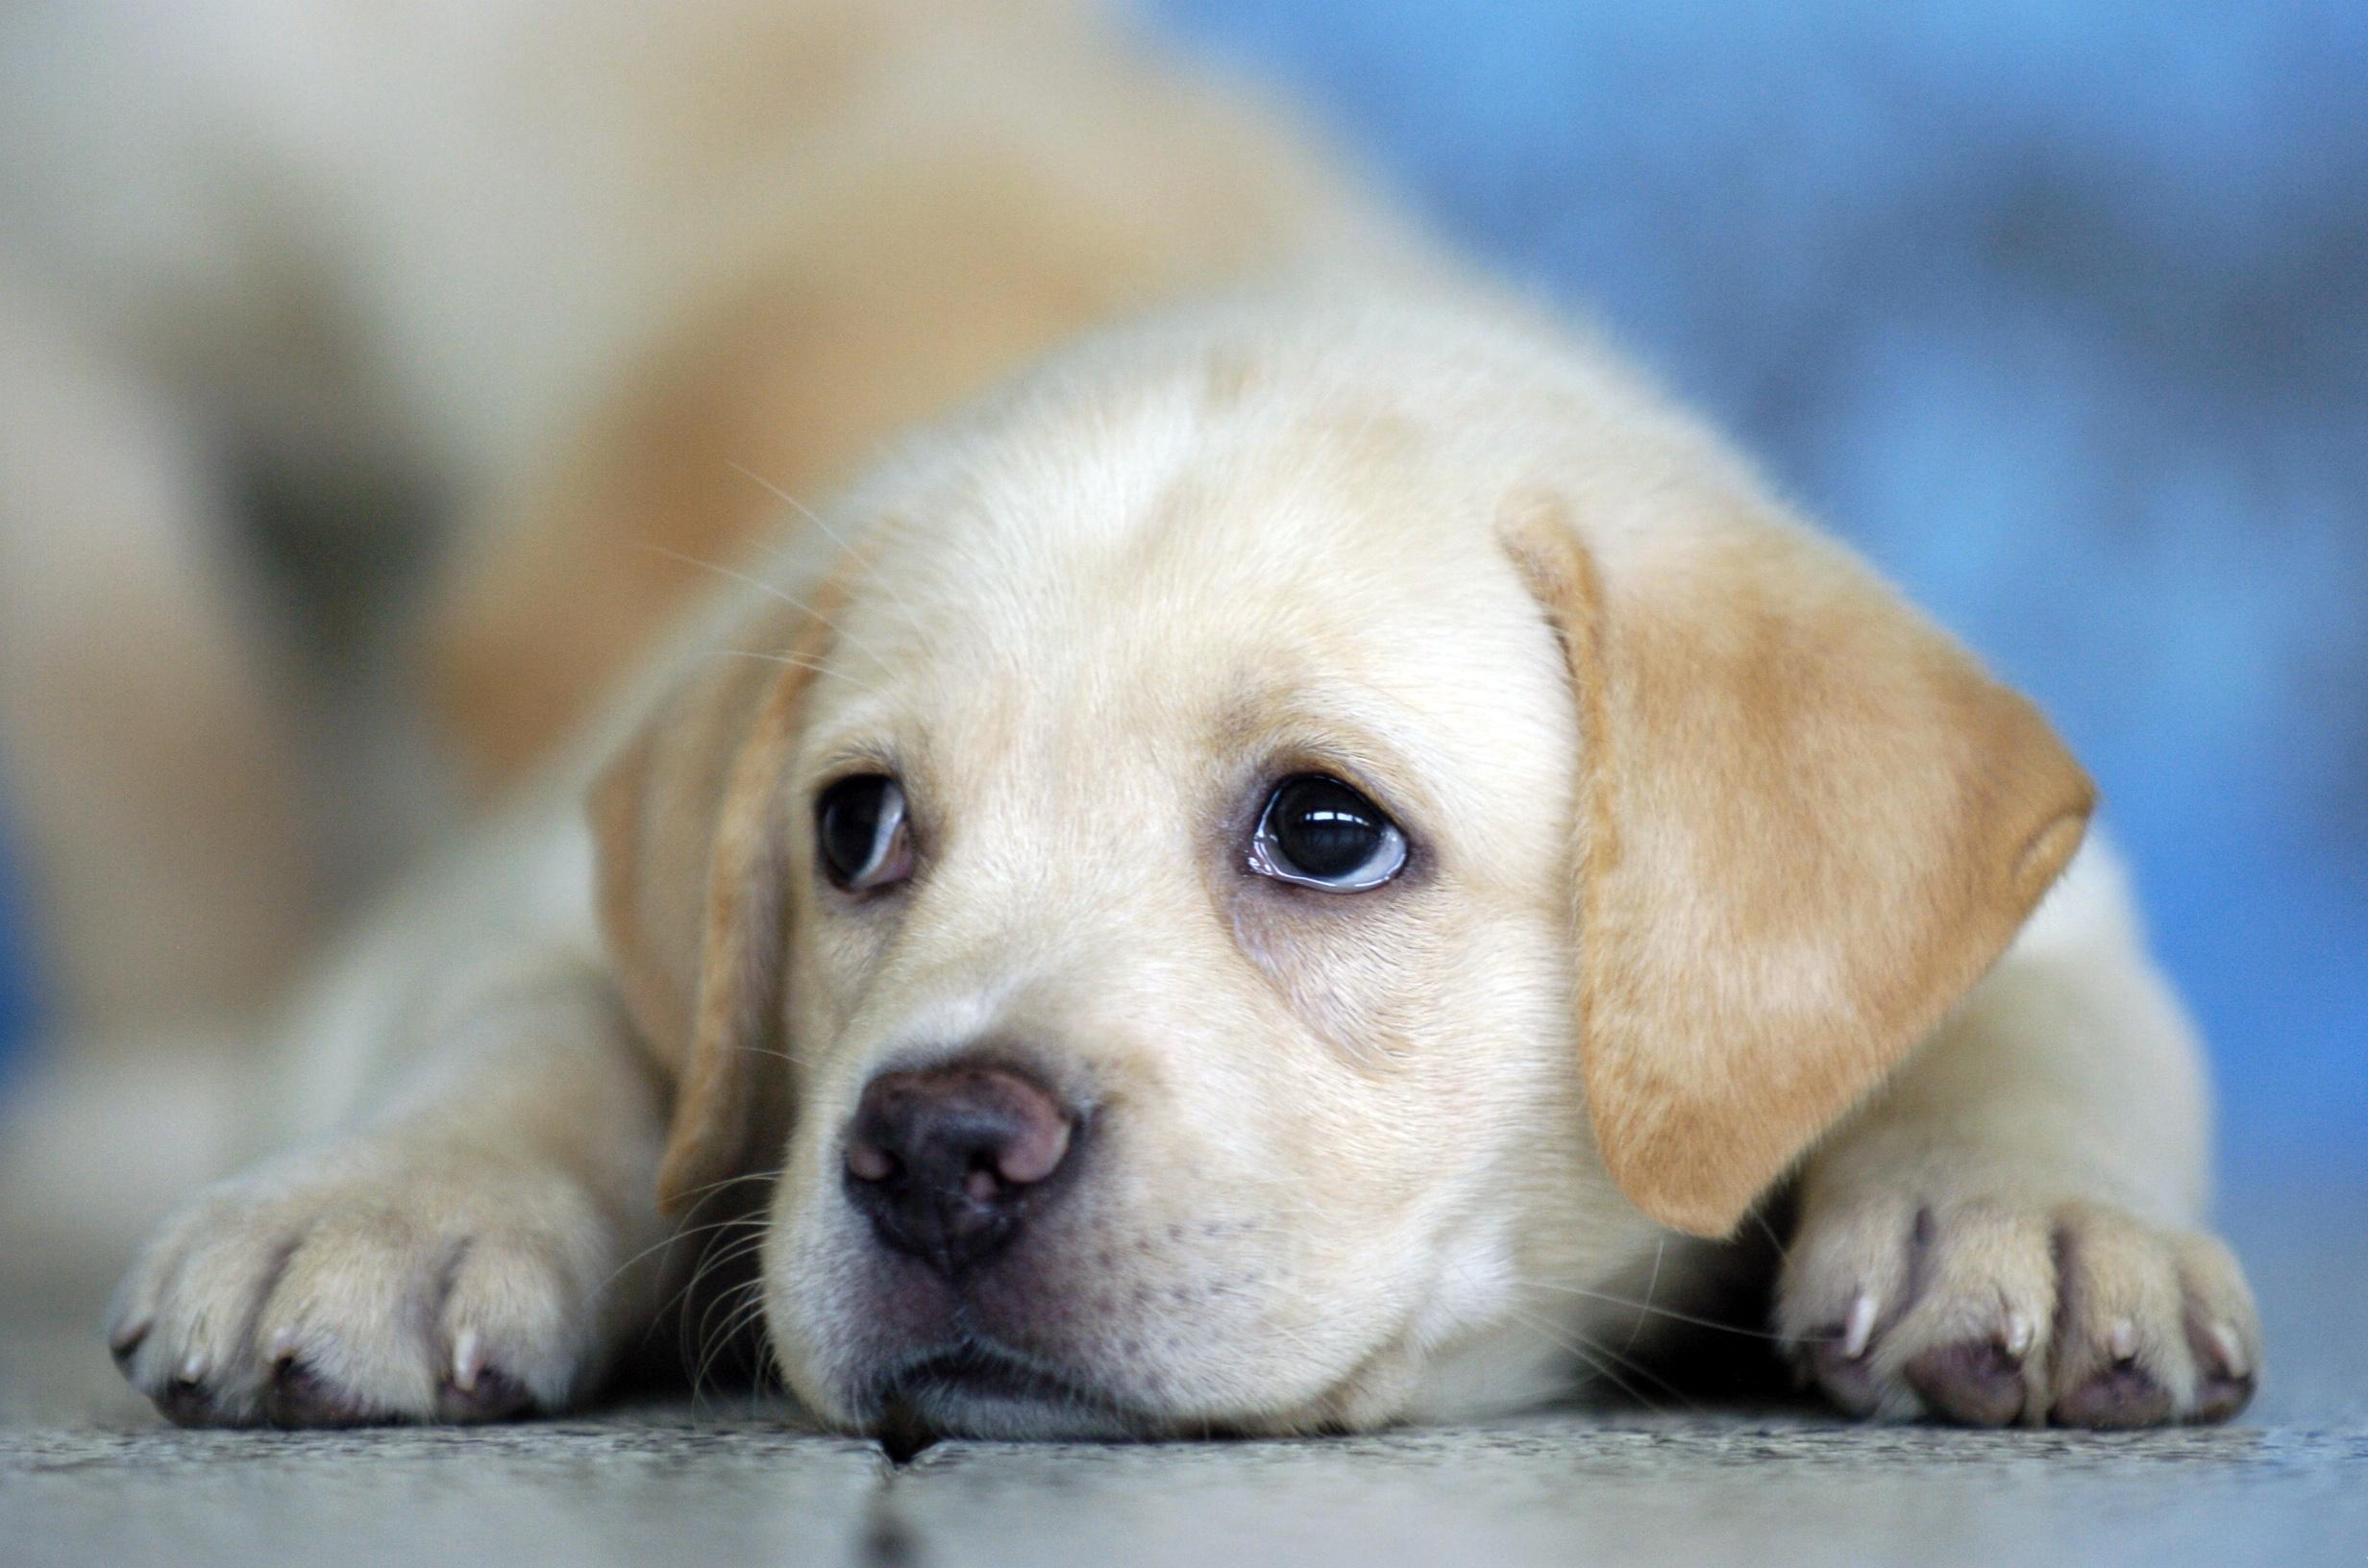 Puppy Wallpaper 25157 2464x1632px